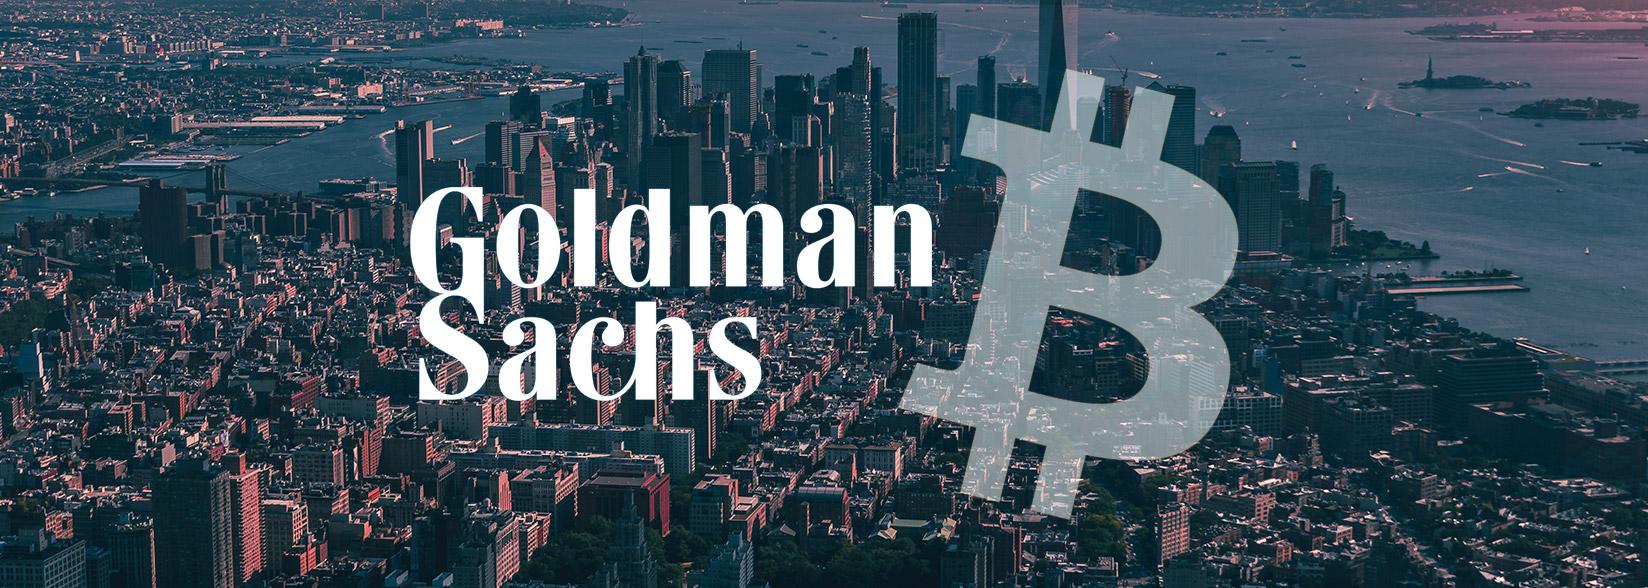 goldman sachs bitcoin)